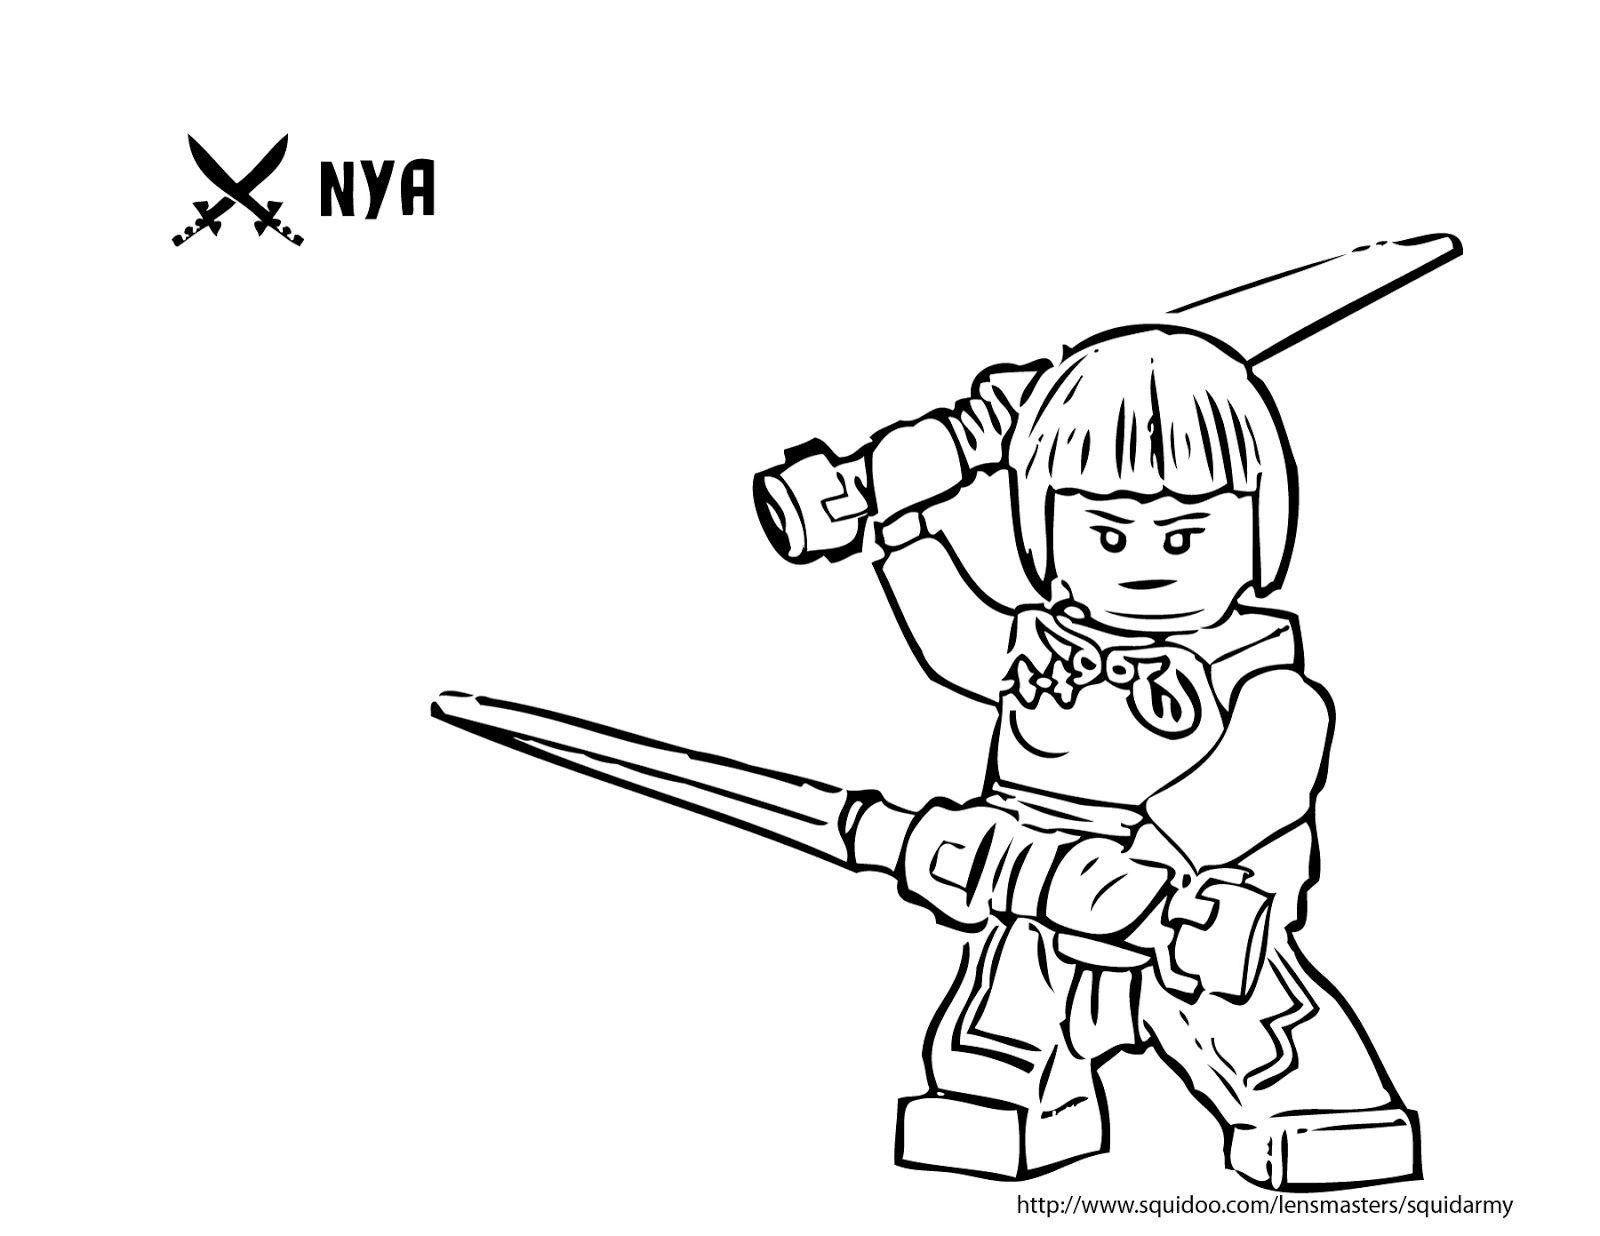 16 Coloriage Ninjago Nya A Imprimer In 2020 Lego Ninjago Birthday Ninjago Coloring Pages Lego Coloring Pages